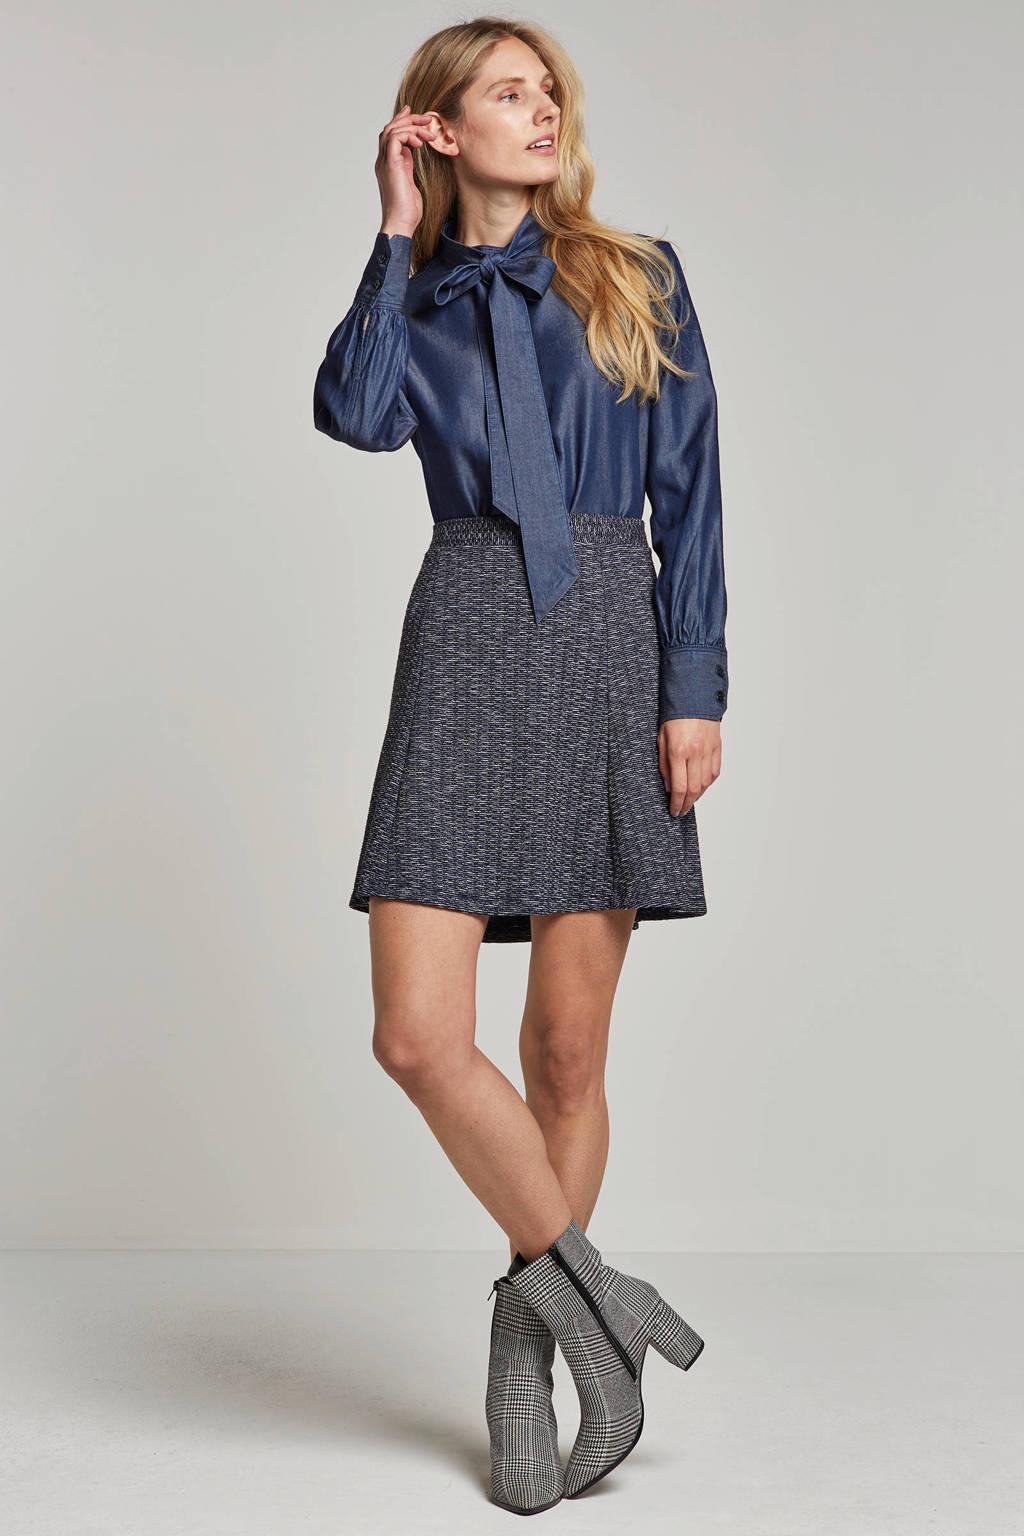 ESPRIT Women Casual gemêleerde rok, Blauw/wit